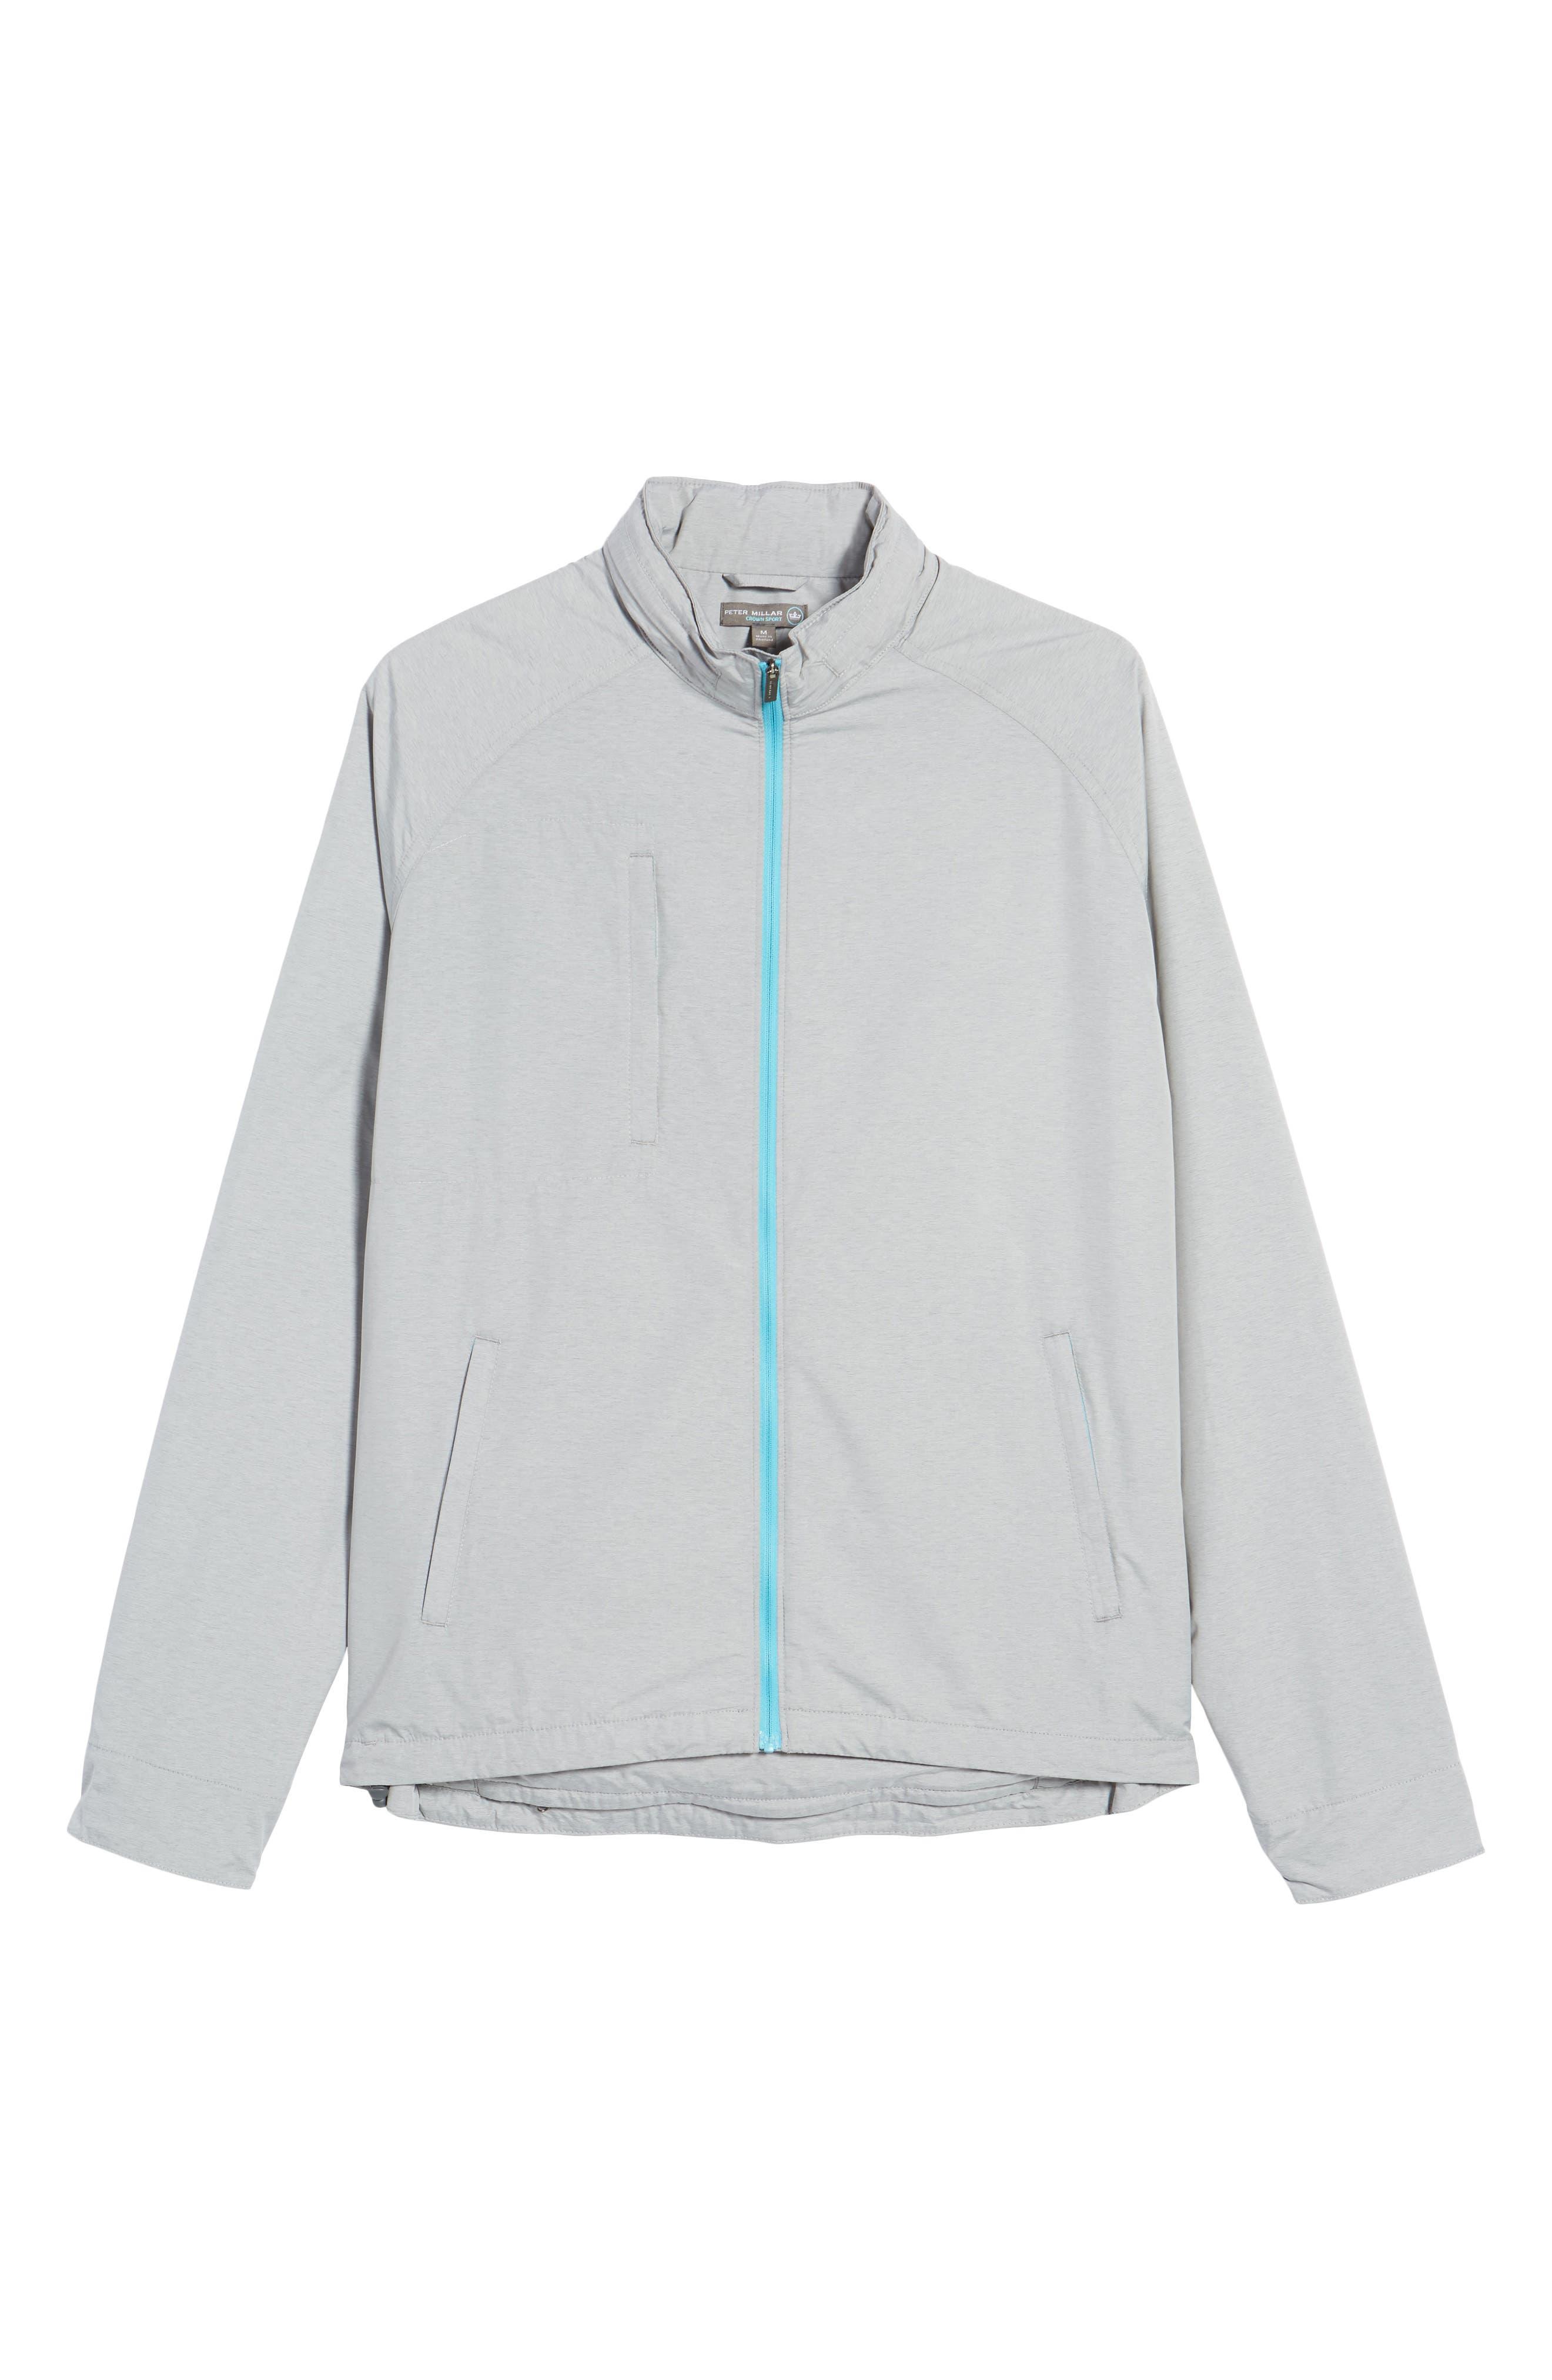 Nagano Windbreaker Jacket,                             Alternate thumbnail 6, color,                             British Grey